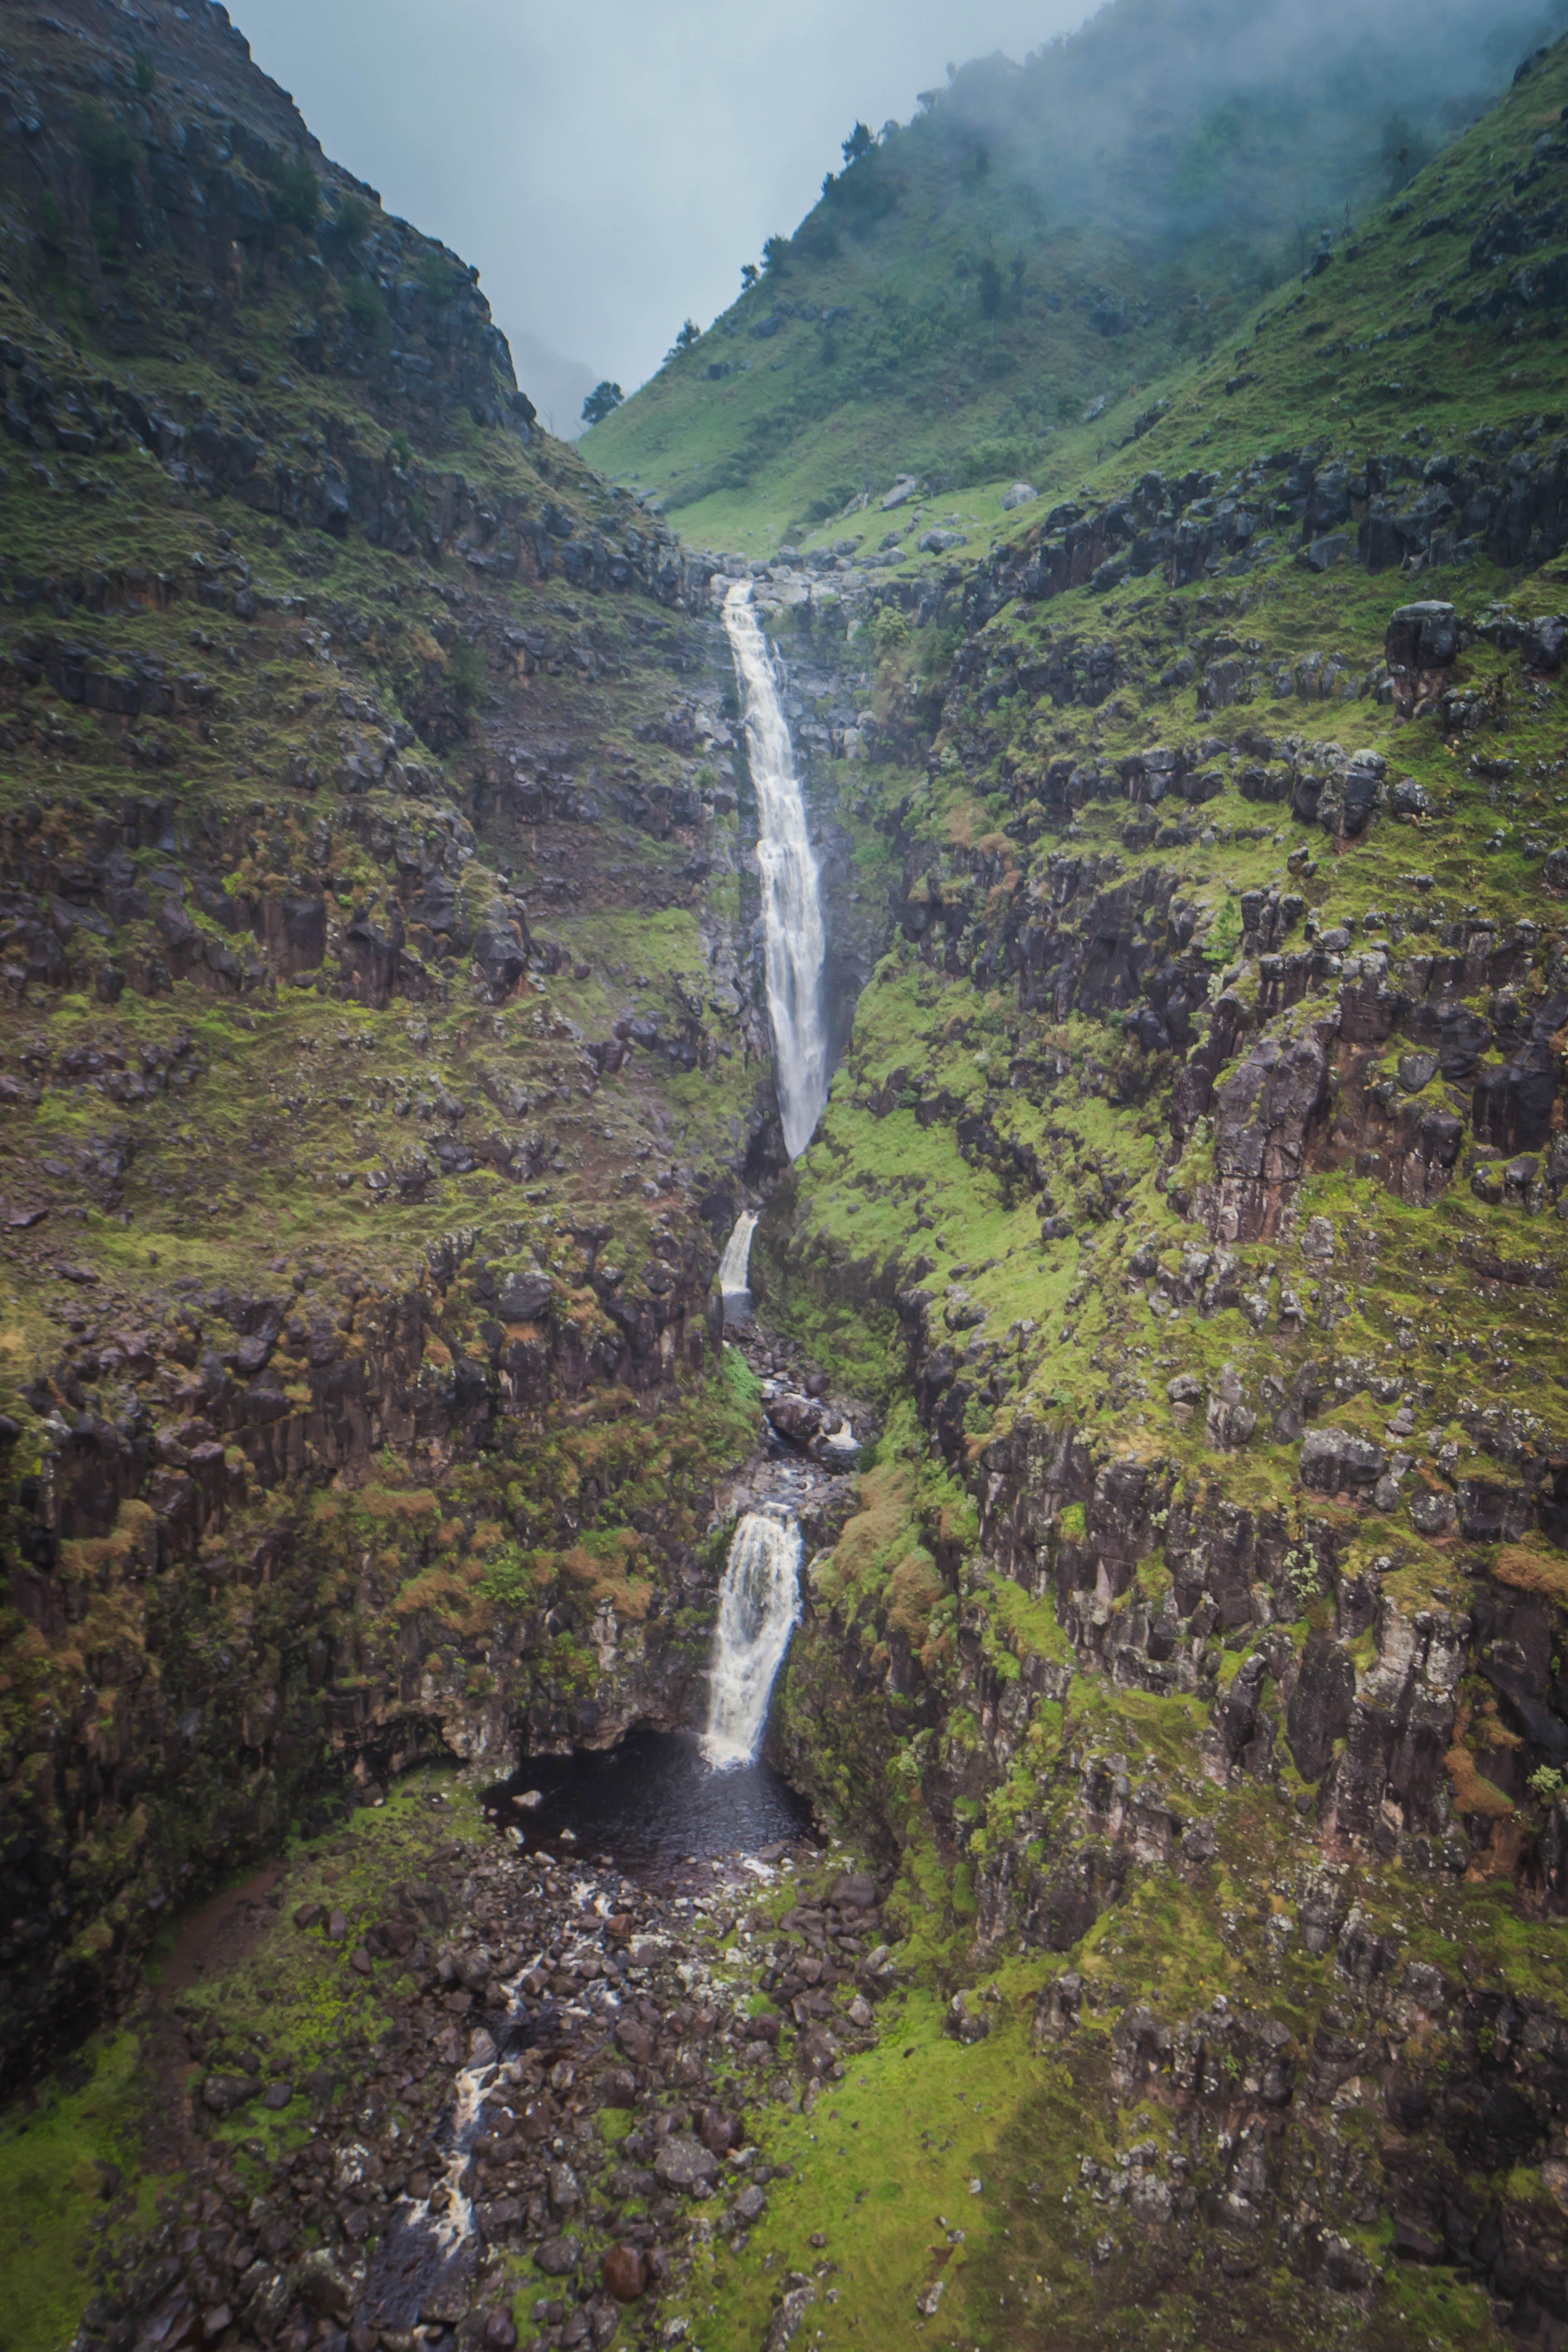 Free stock photo of hawaii, jurassic falls, jurassic park, kauai